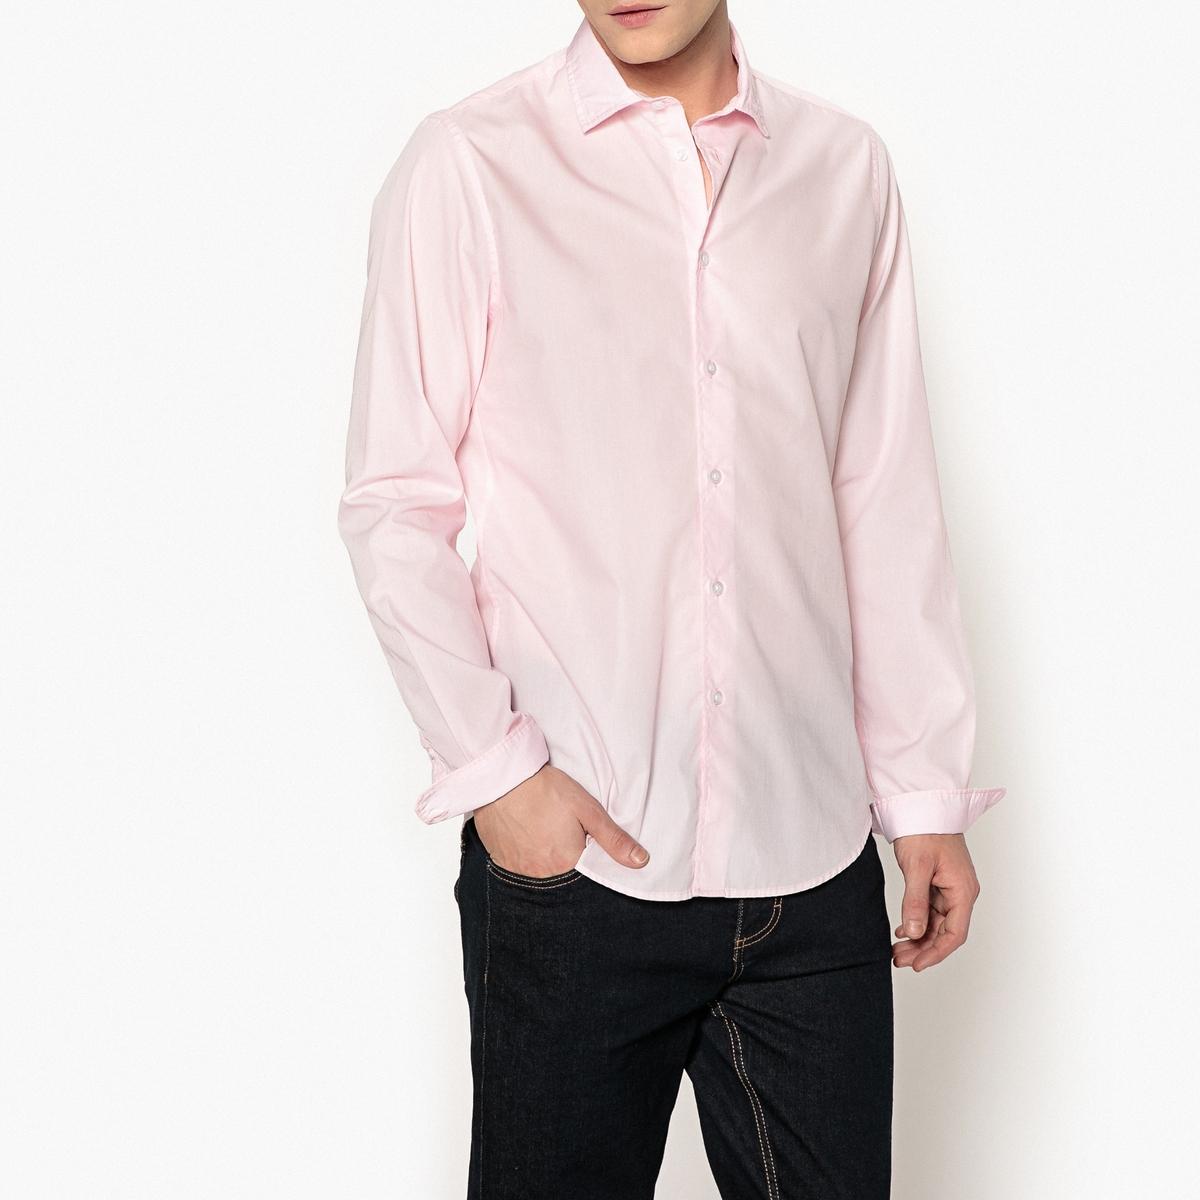 цена Рубашка La Redoute Узкого покроя 49/50 розовый онлайн в 2017 году